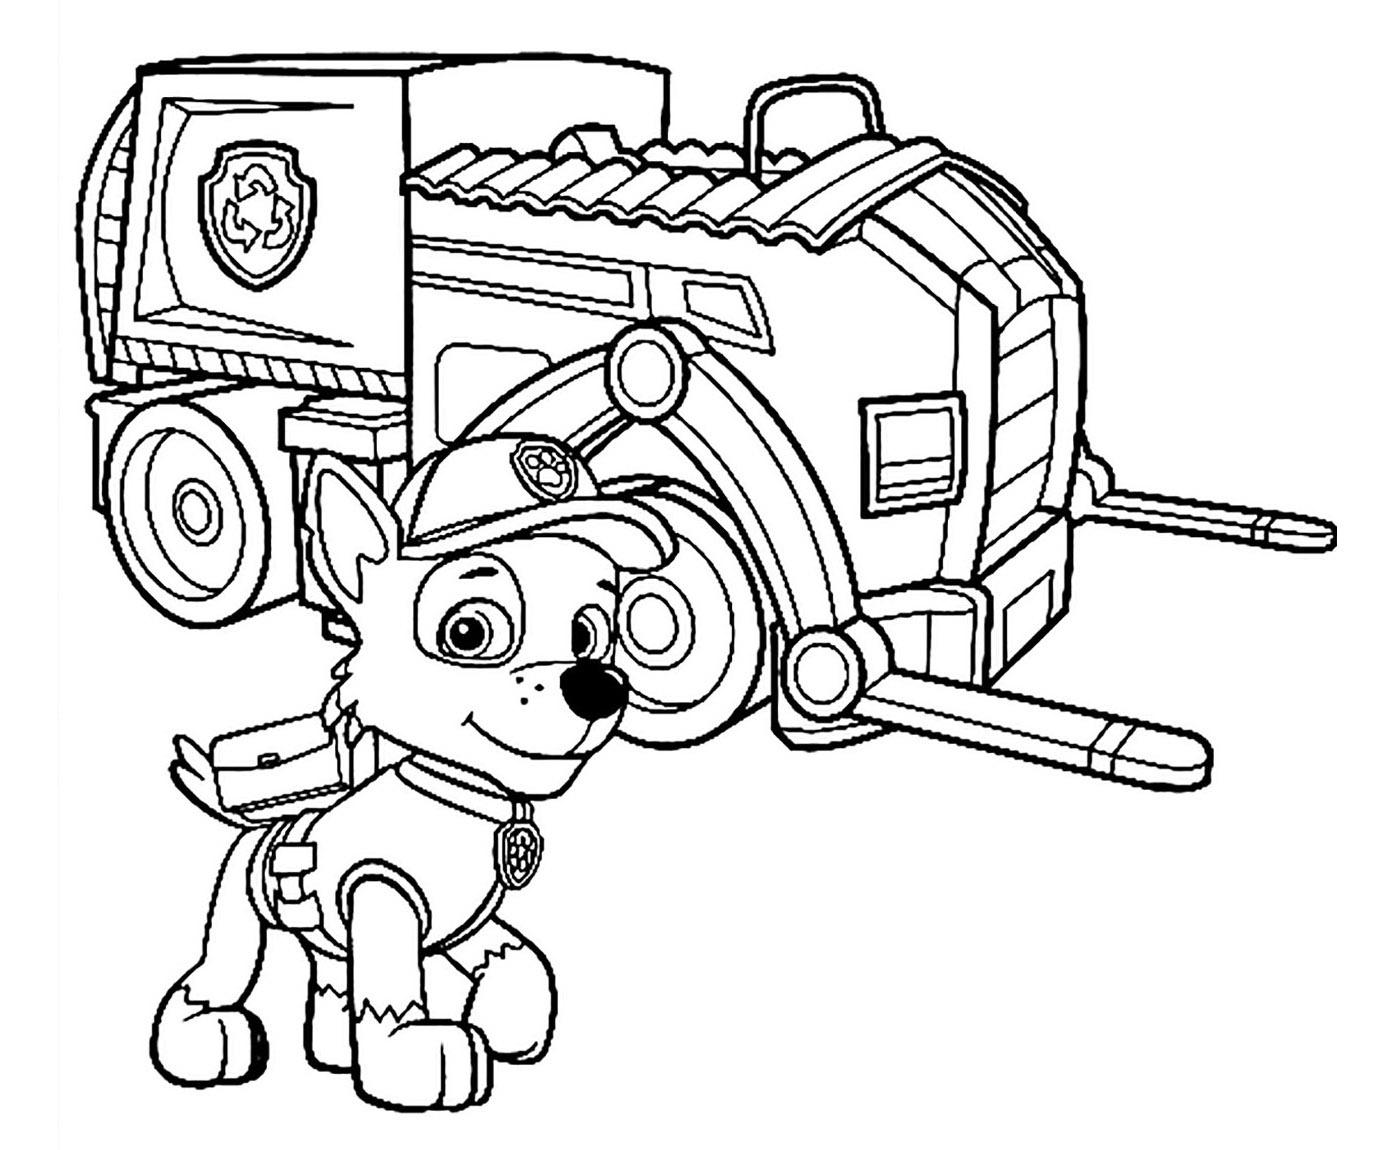 Paw Patrol To Print For Free - Paw Patrol Kids Coloring Pages pour Coloriage A4 À Imprimer